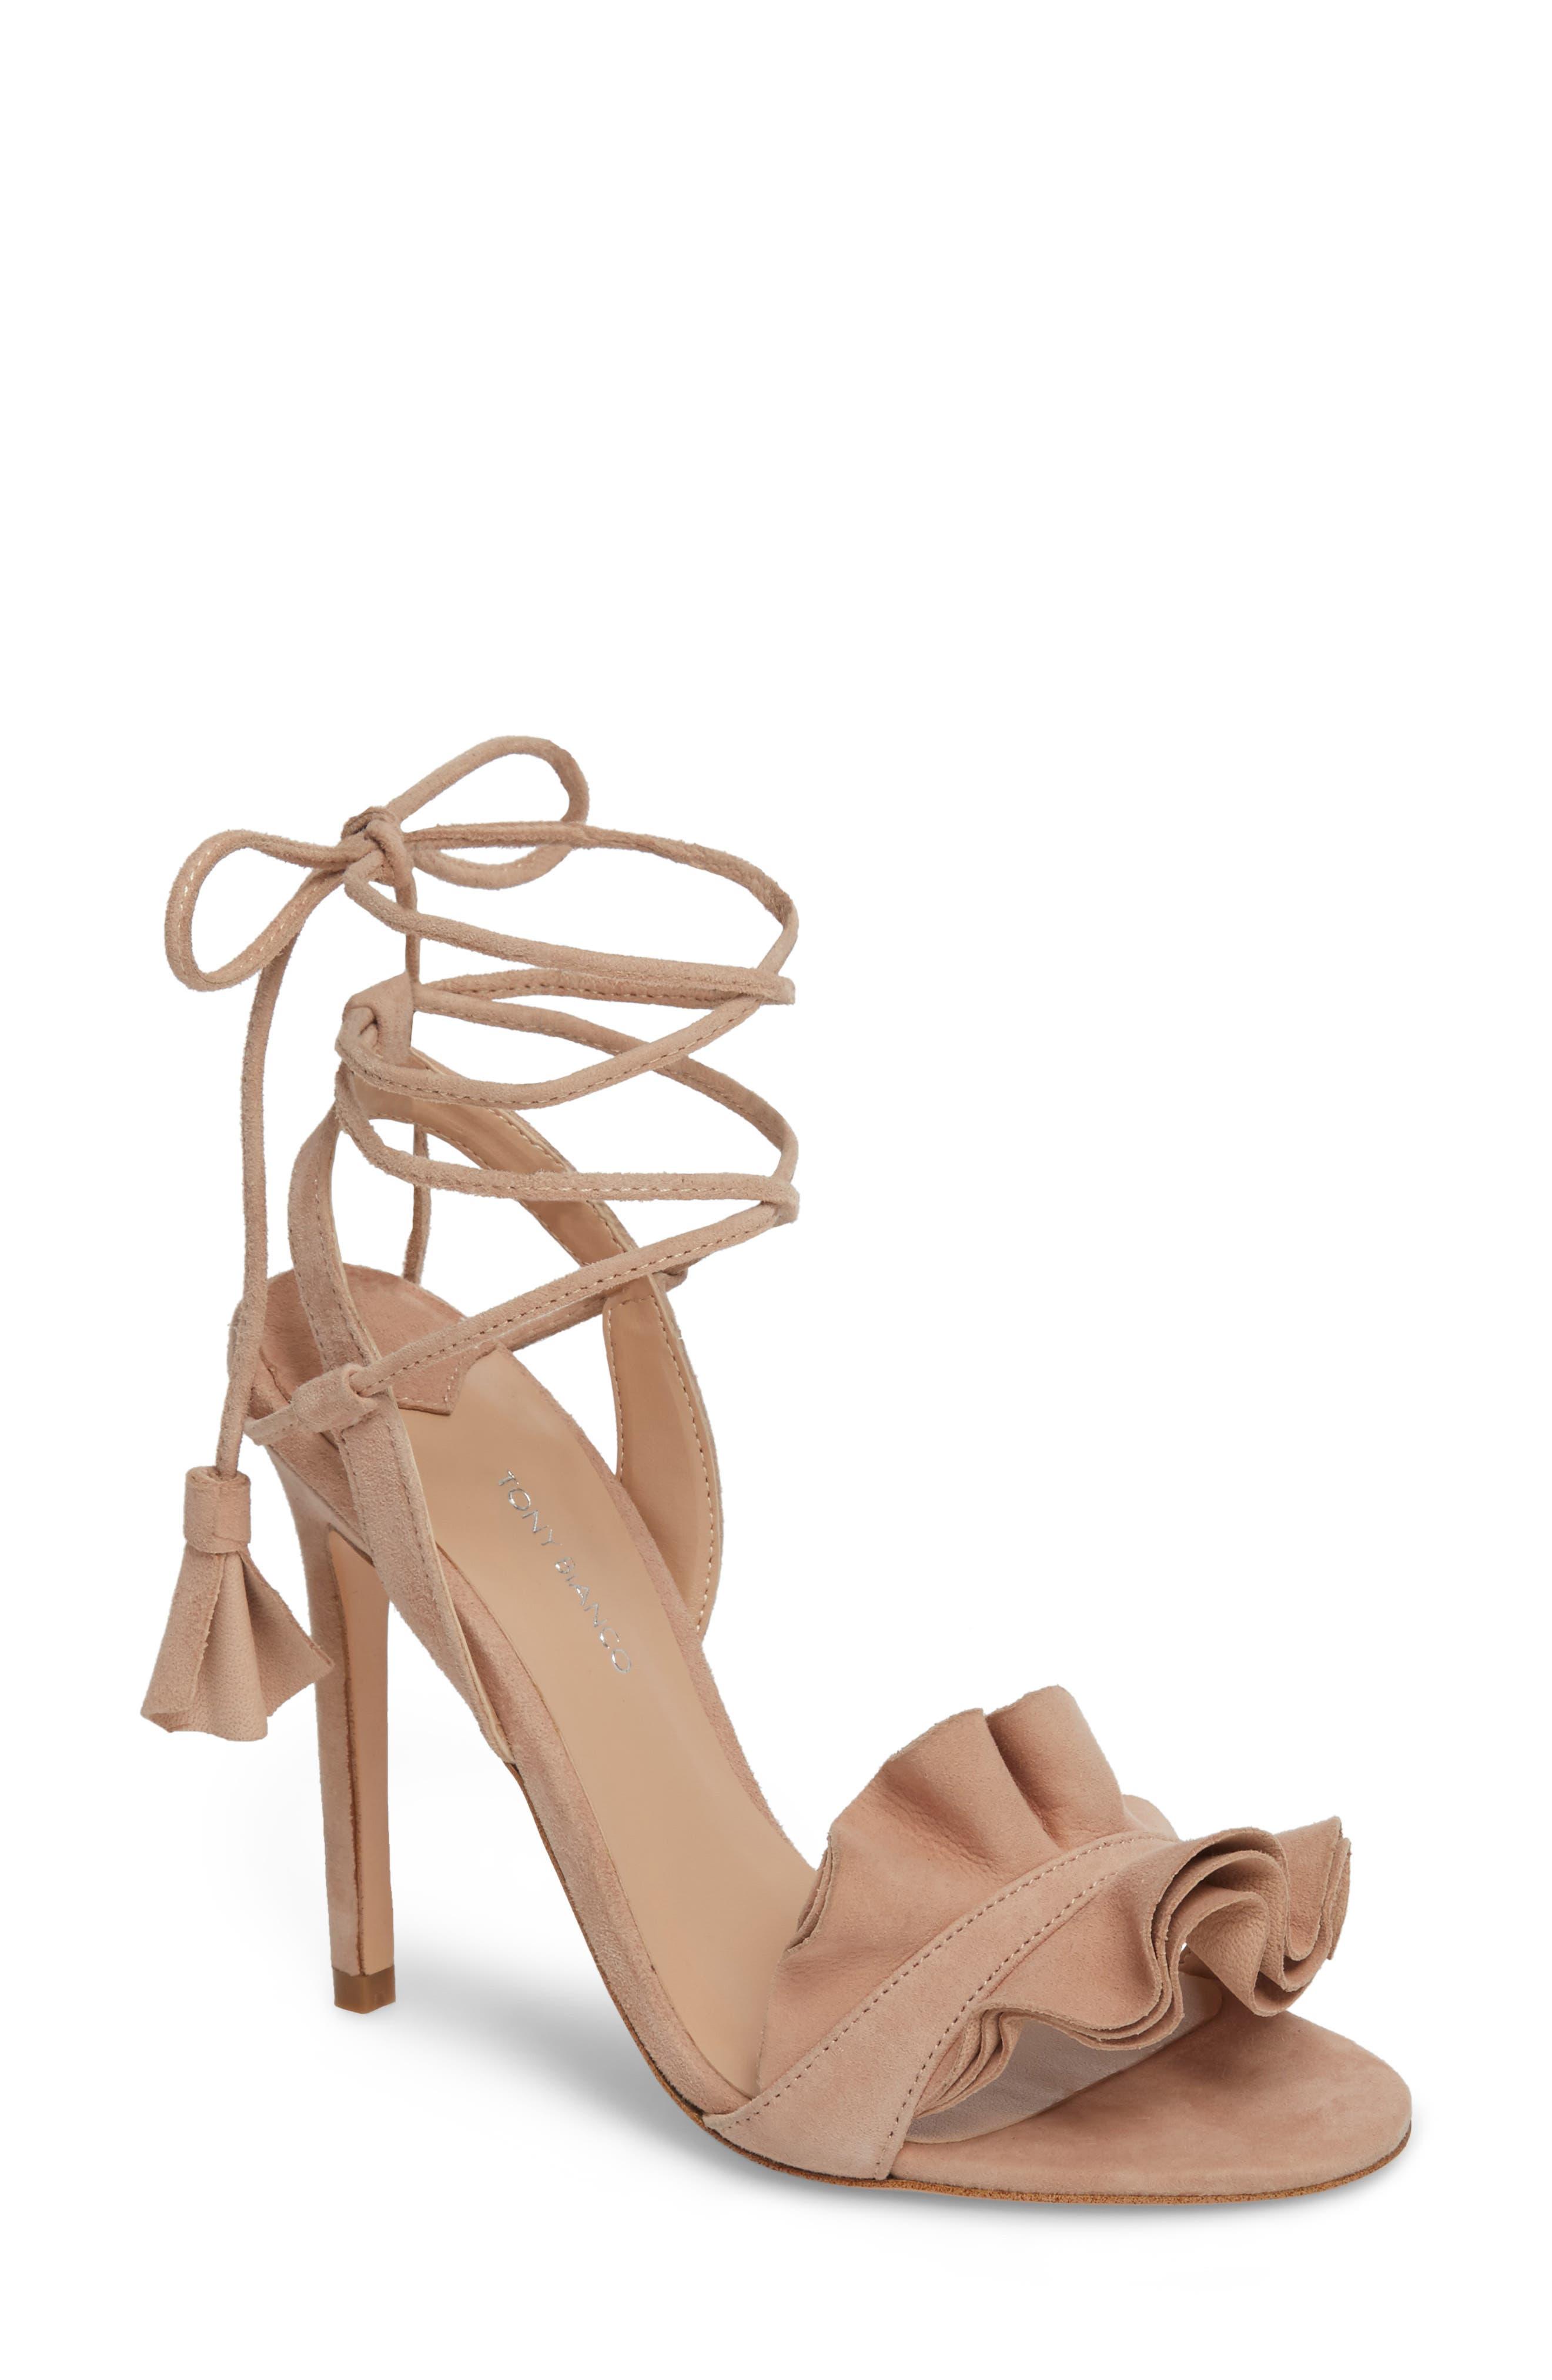 Kalipso Ruffled Wraparound Sandal,                             Main thumbnail 1, color,                             Blush Suede